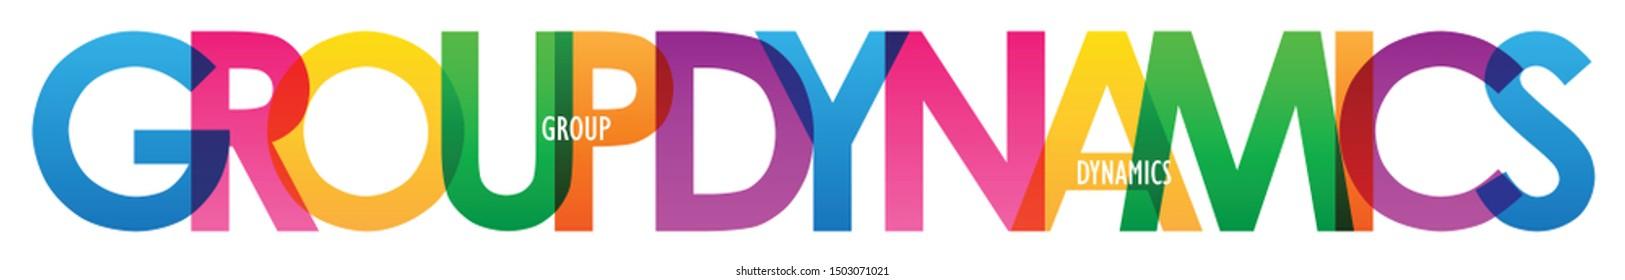 Group Dynamics Images, Stock Photos & Vectors | Shutterstock